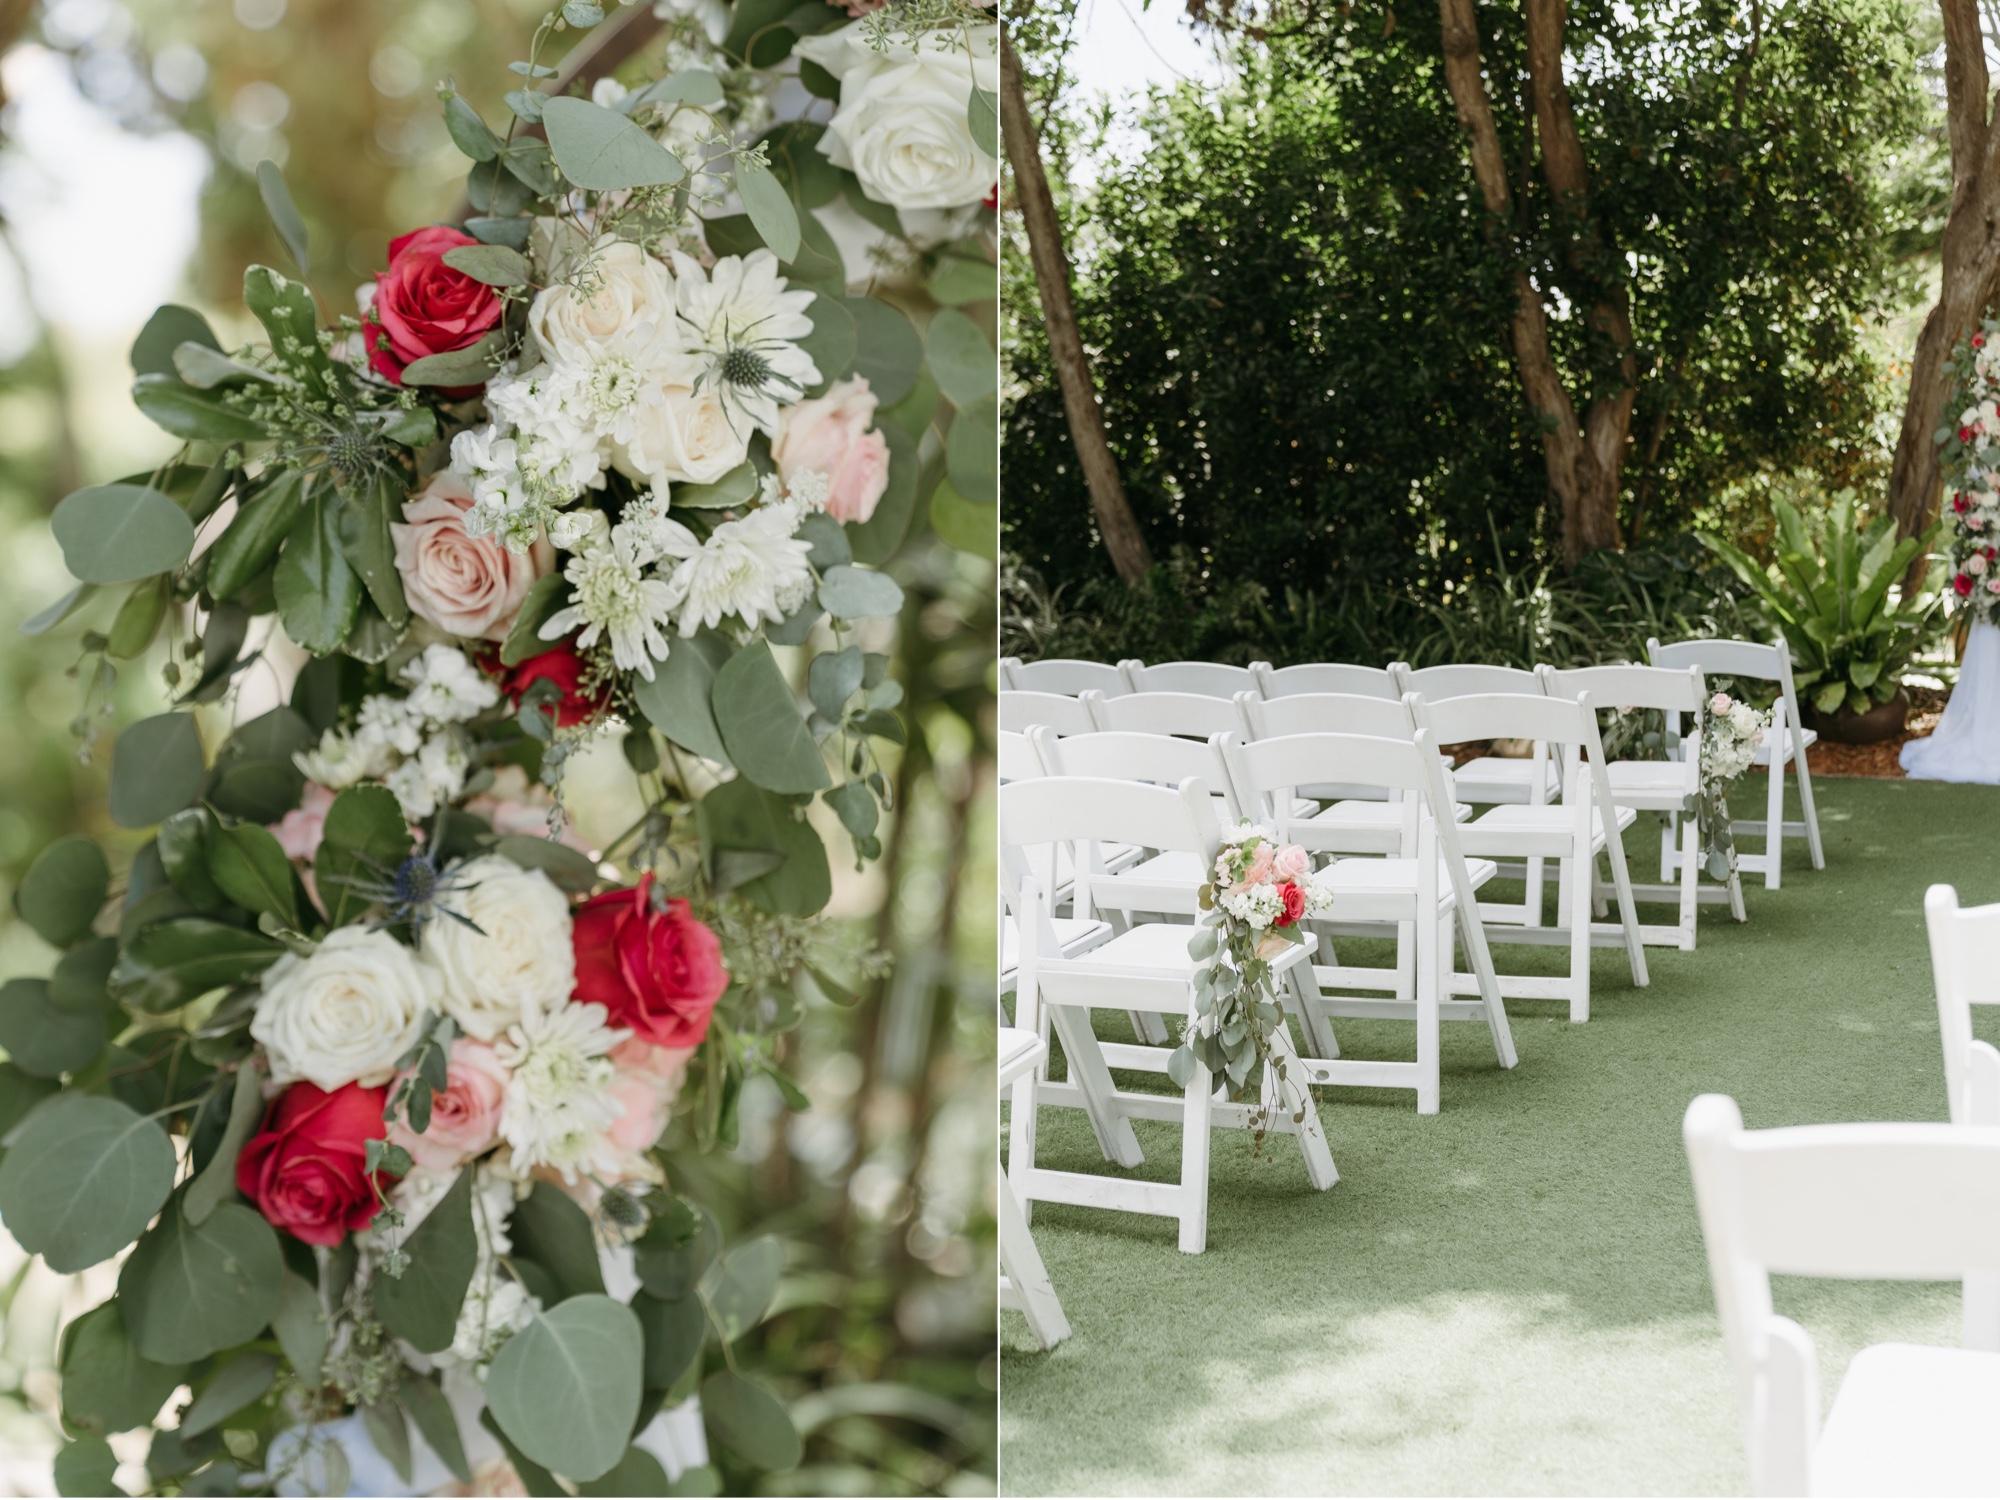 003_Shawna and Steve's Wedding-14_Shawna and Steve's Wedding-8_florals_wedding_day_for.jpg